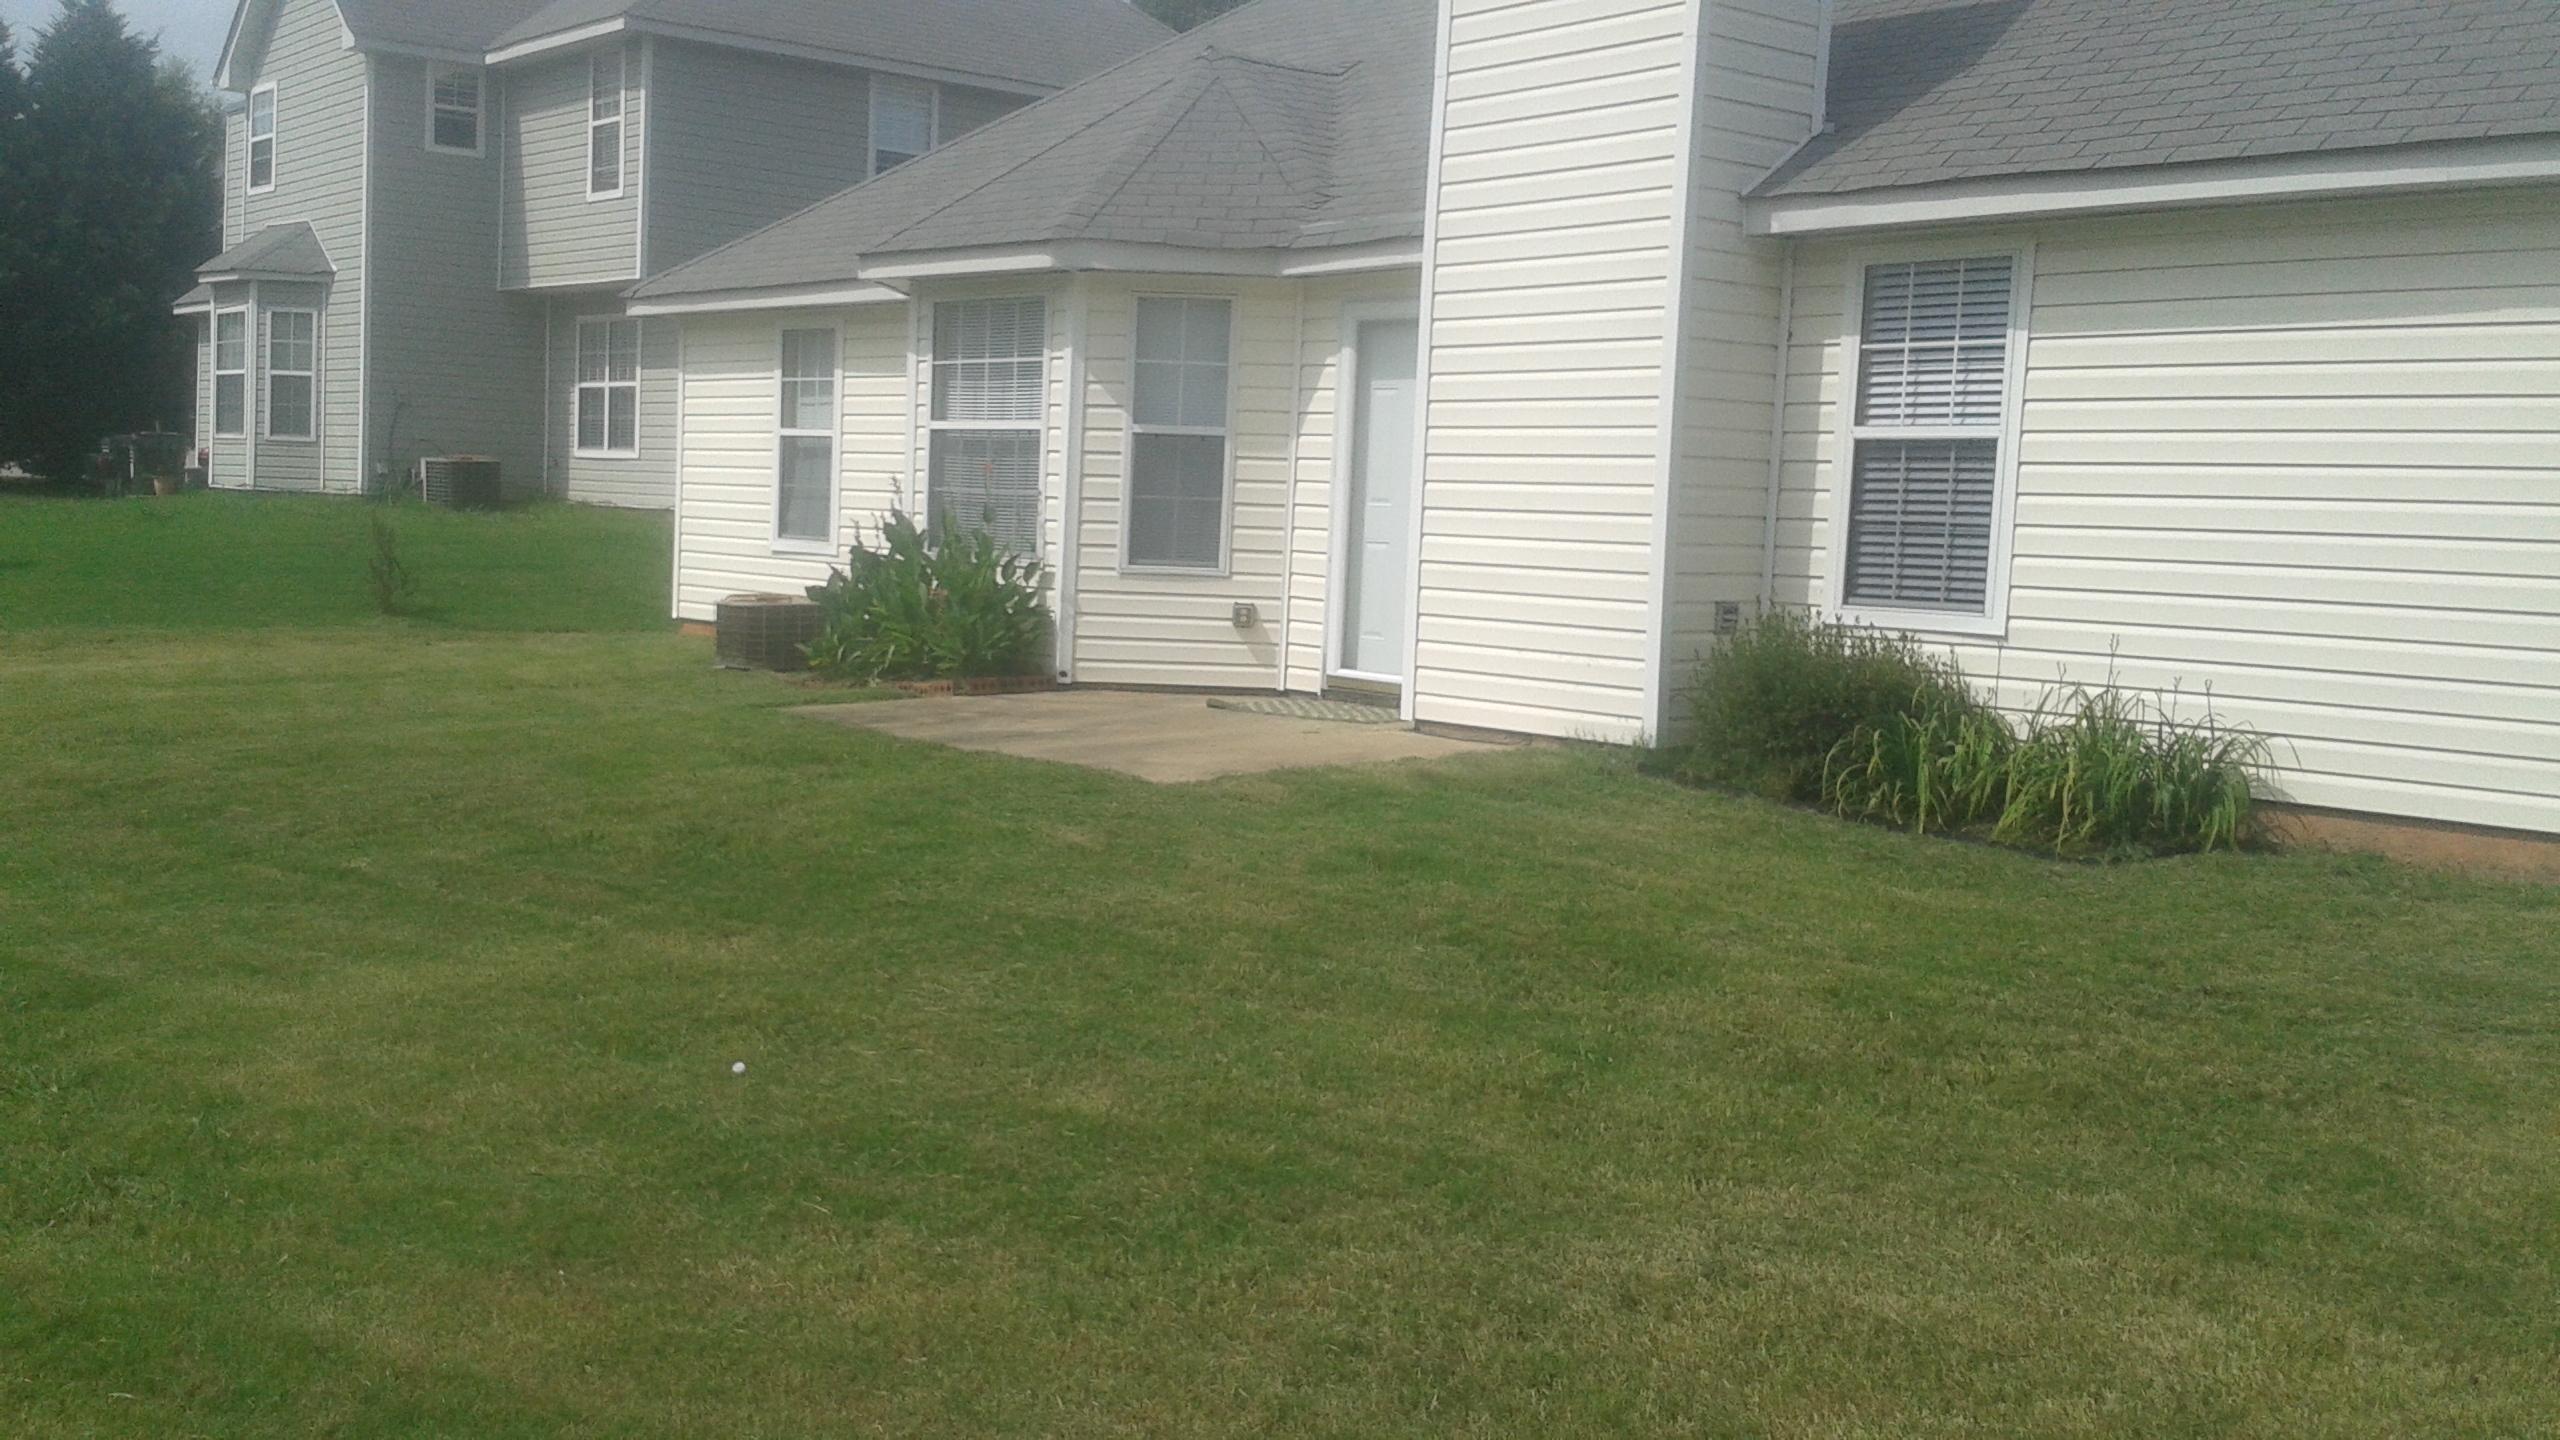 Order Lawn Care in Lawrenceville, GA, 30044